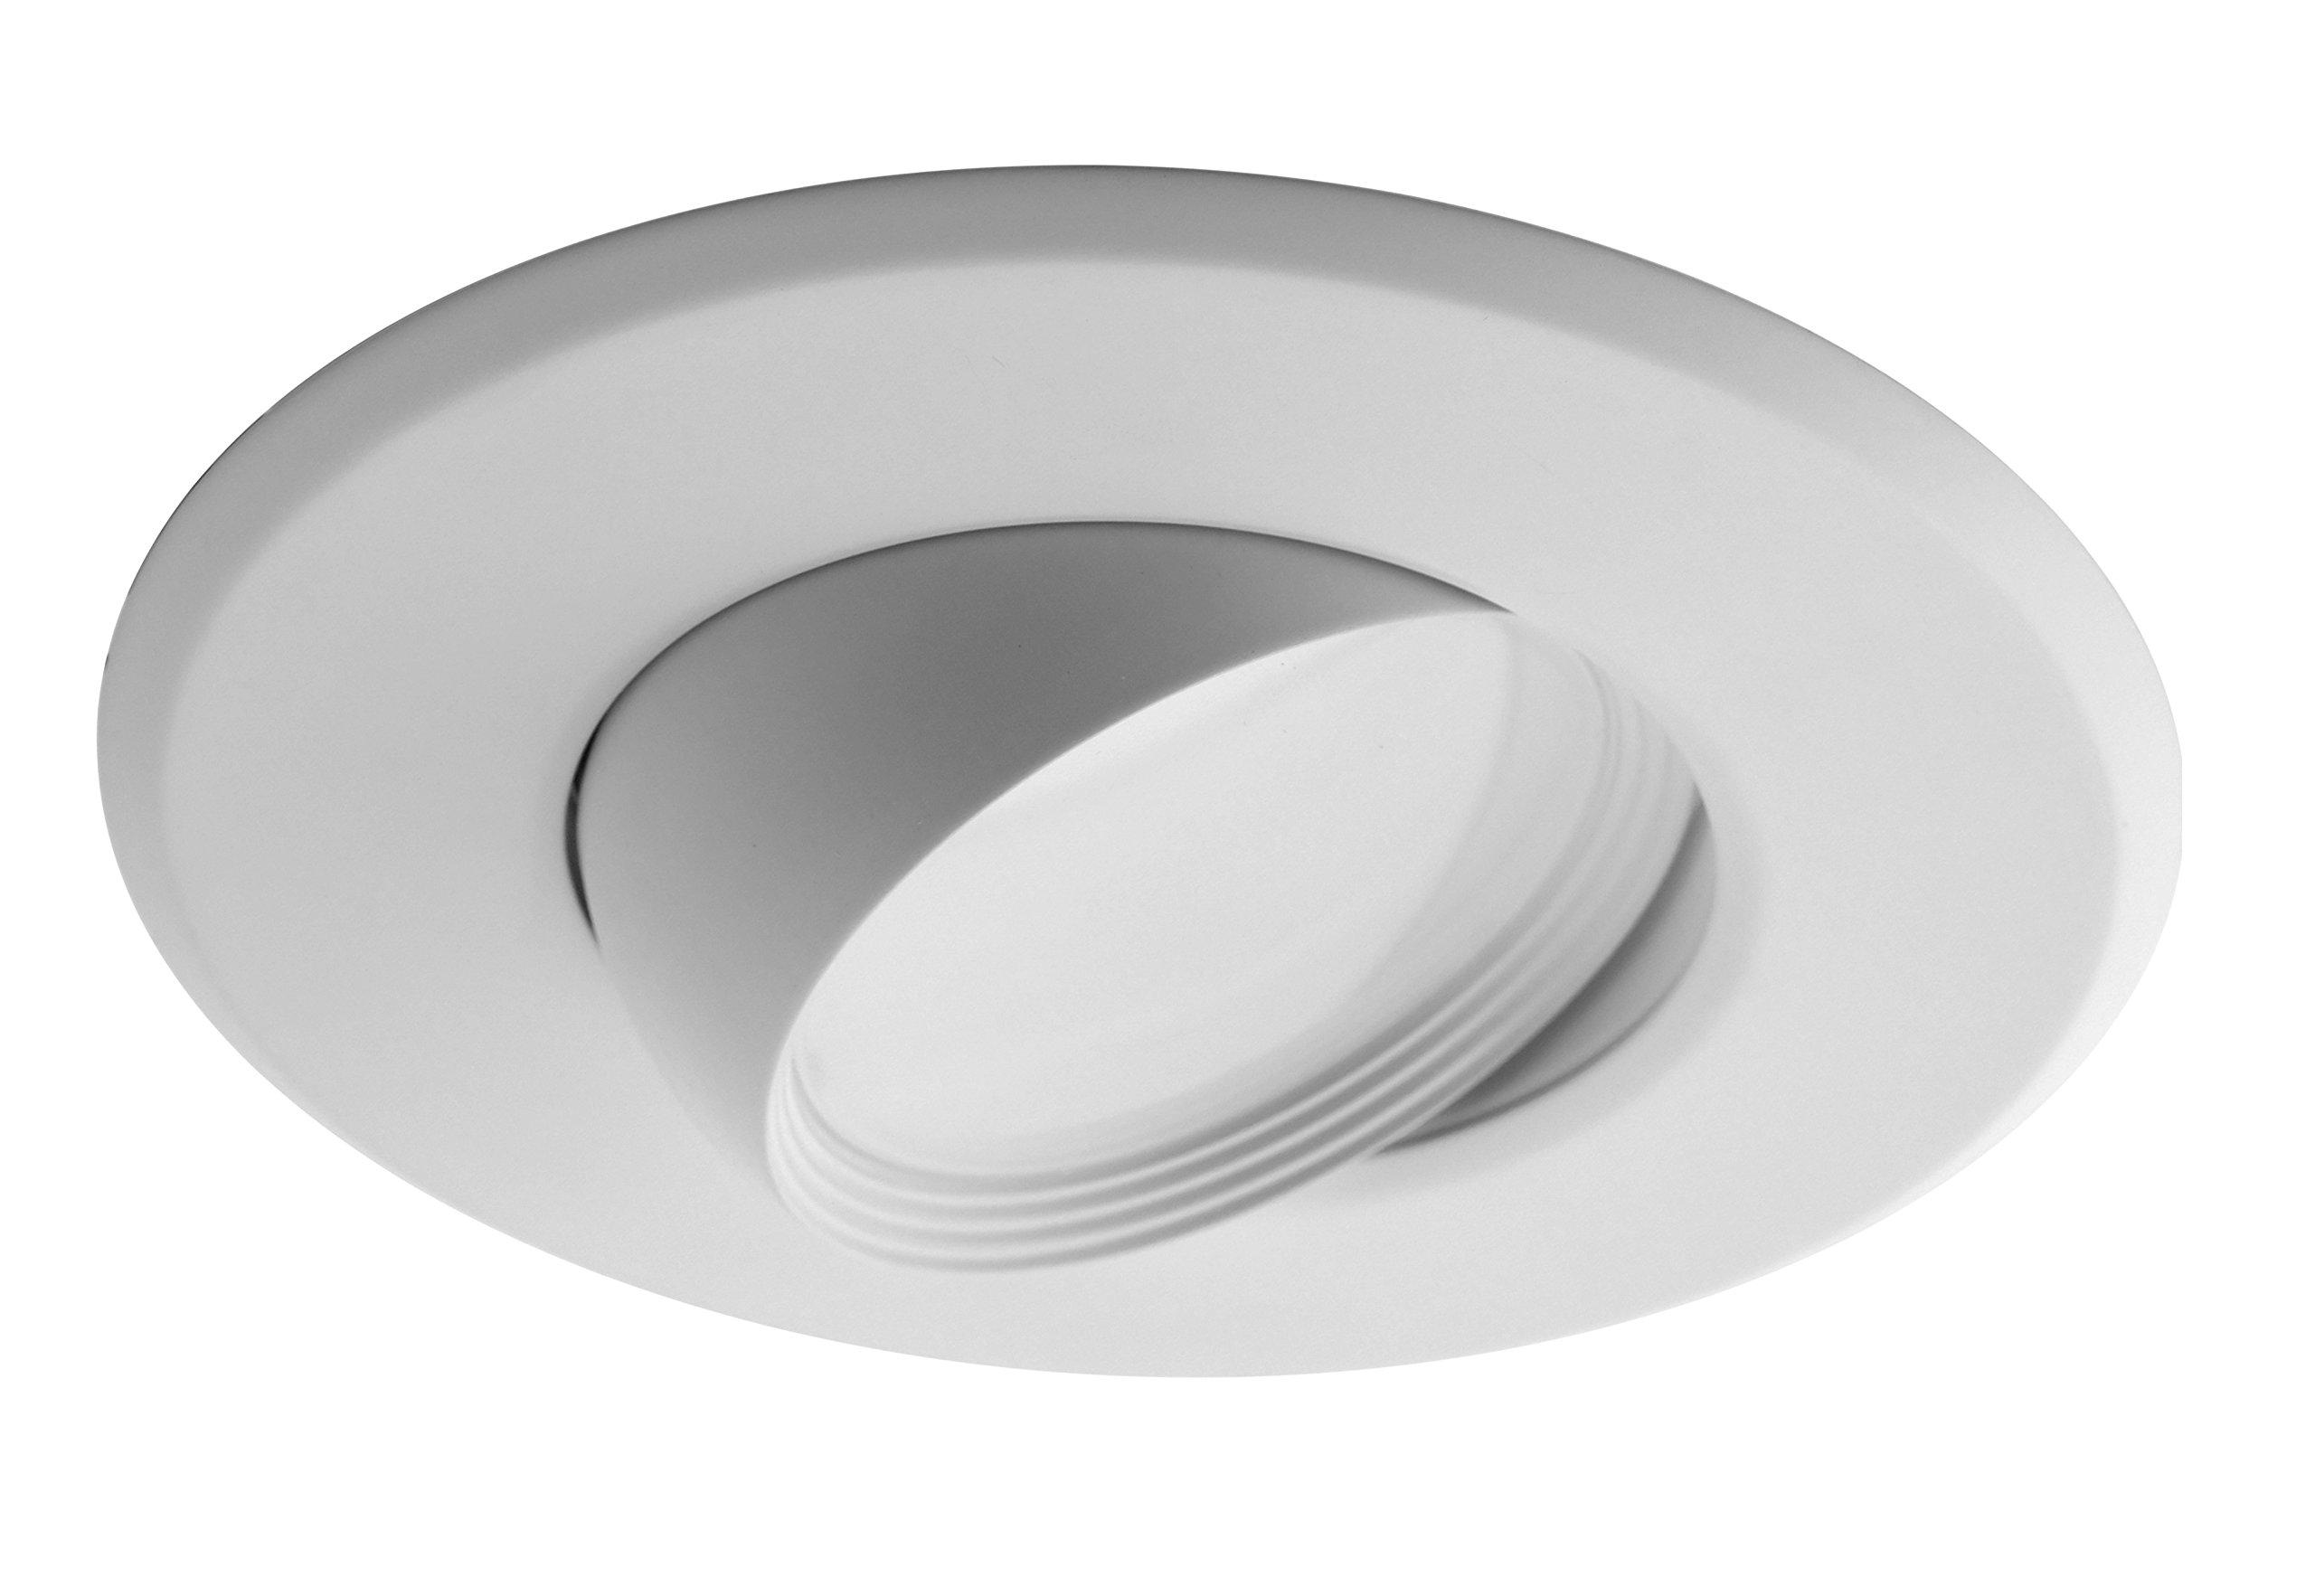 NICOR Lighting 5/6-Inch Dimmable 4000K Adjustable Eyeball LED Recessed Retrofit Downlight, White (DEB56-20-120-4K-WH)